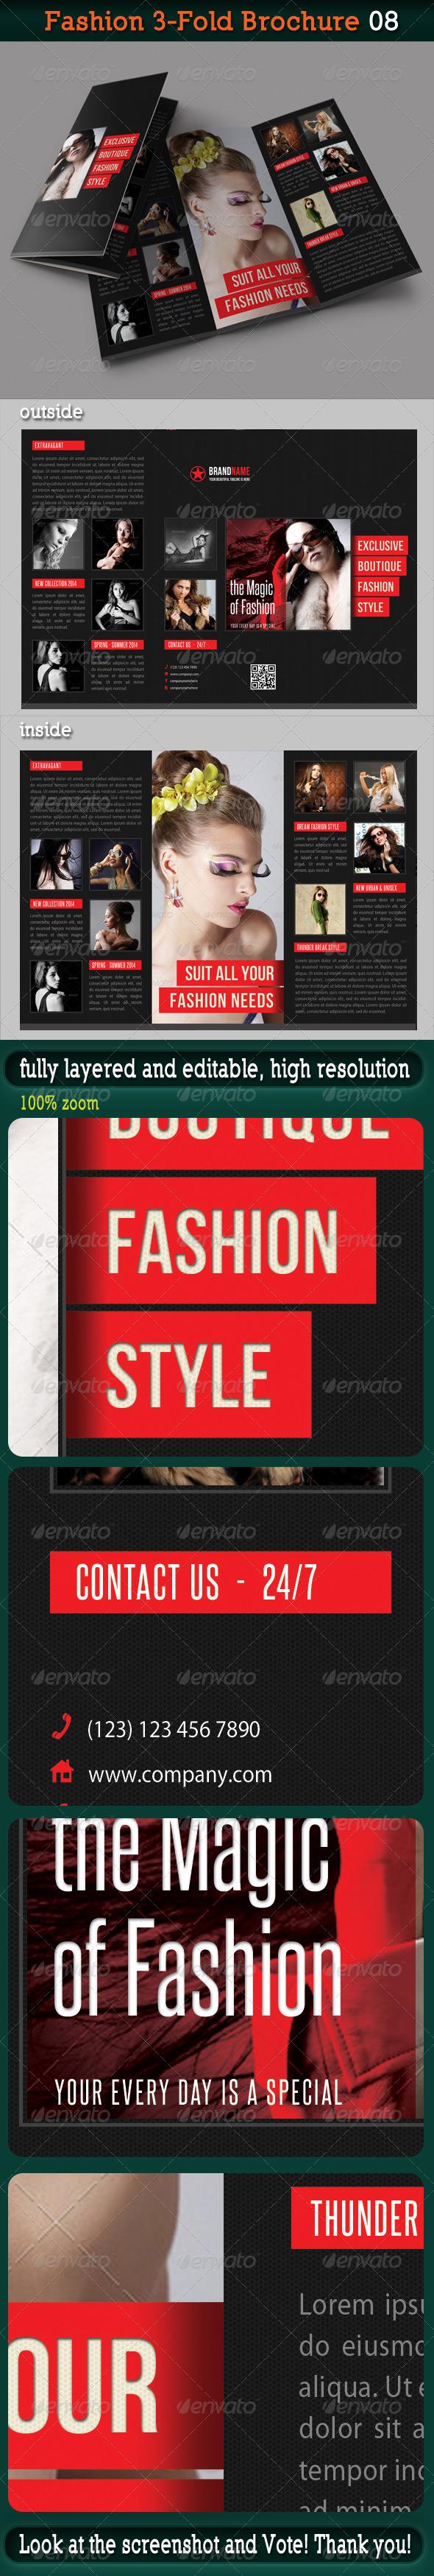 Fashion 3-Fold Brochure 08 - Catalogs Brochures